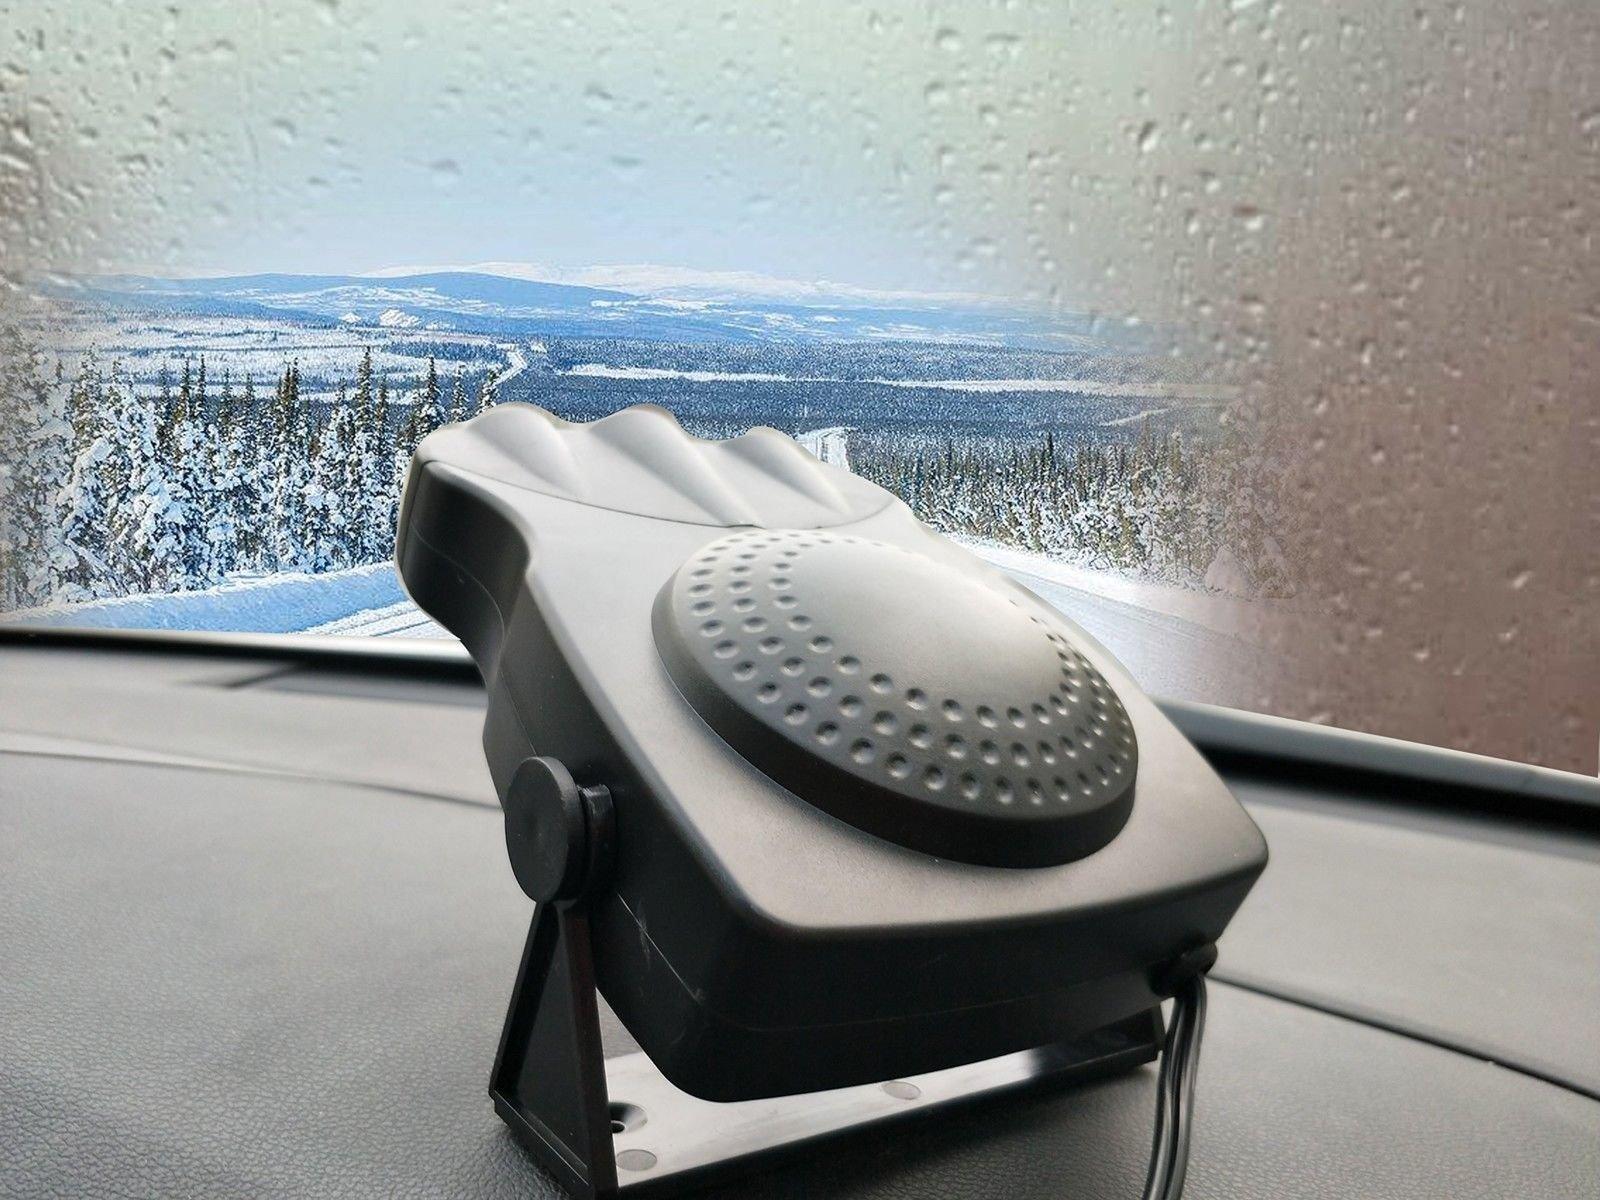 Portable Car Heater Fan, ixaer Car Vehicle Heating Cooling Fan 30 Seconds Fast Heating Quickly Defrosts Defogger 12V 150W Auto Ceramic Heater Cooling Fan 3-Outlet - Winter Auto Windscreen Heater Fan